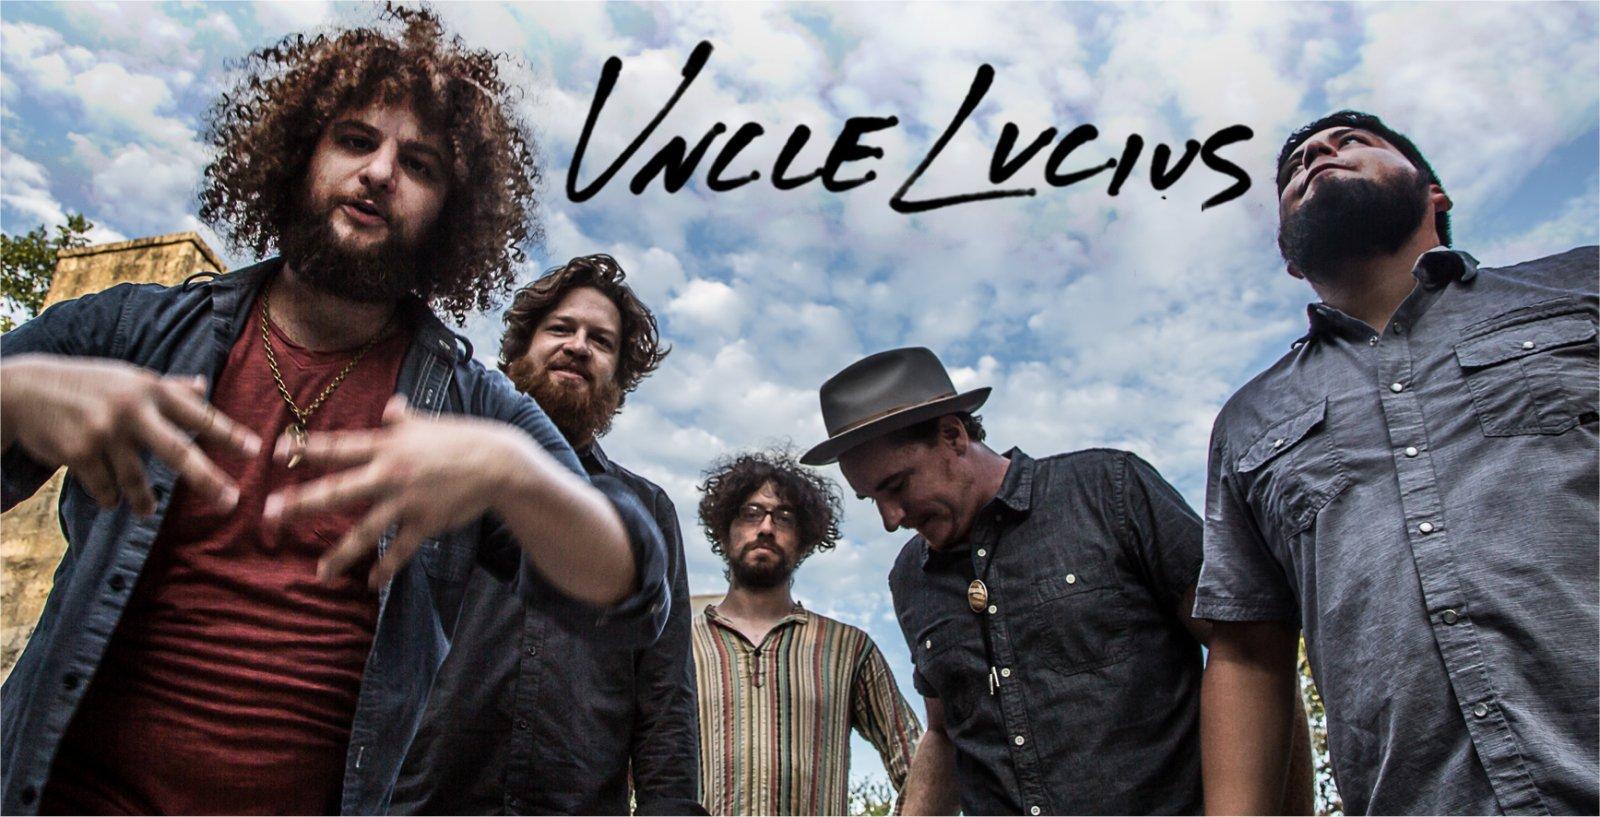 Uncle Lucius